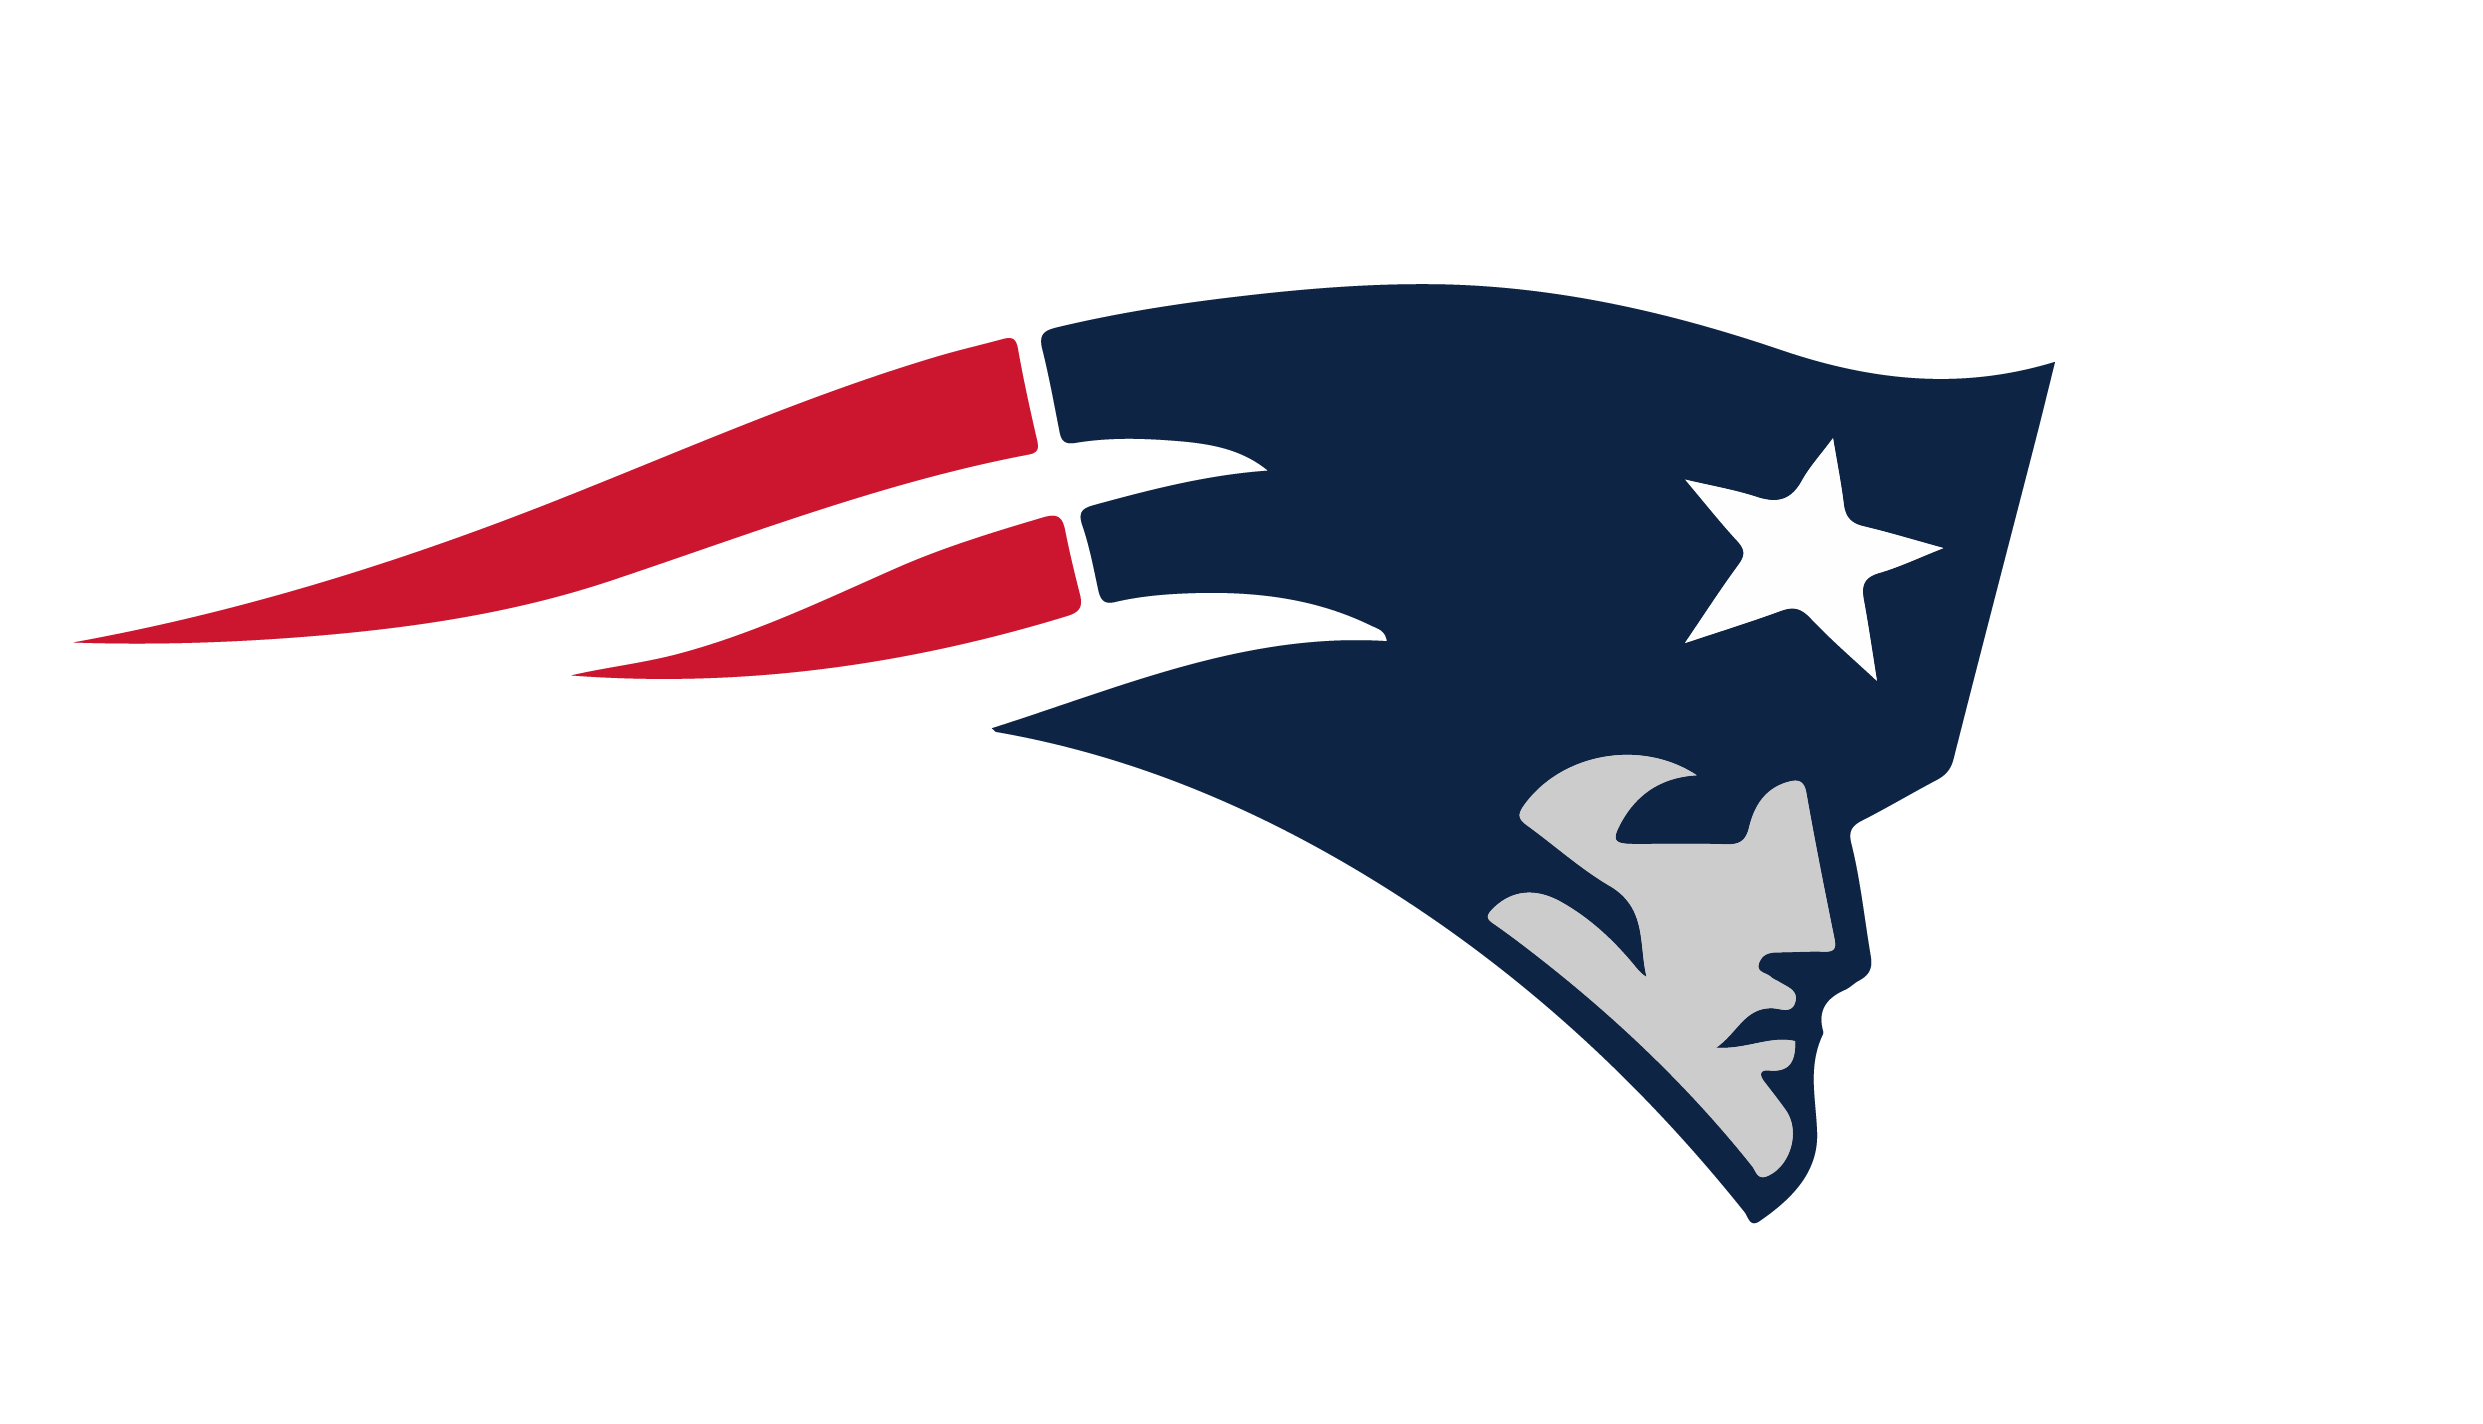 New England Patriots Logo Symbol Png Image New England Patriots Logo Patriots Logo New England Patriots